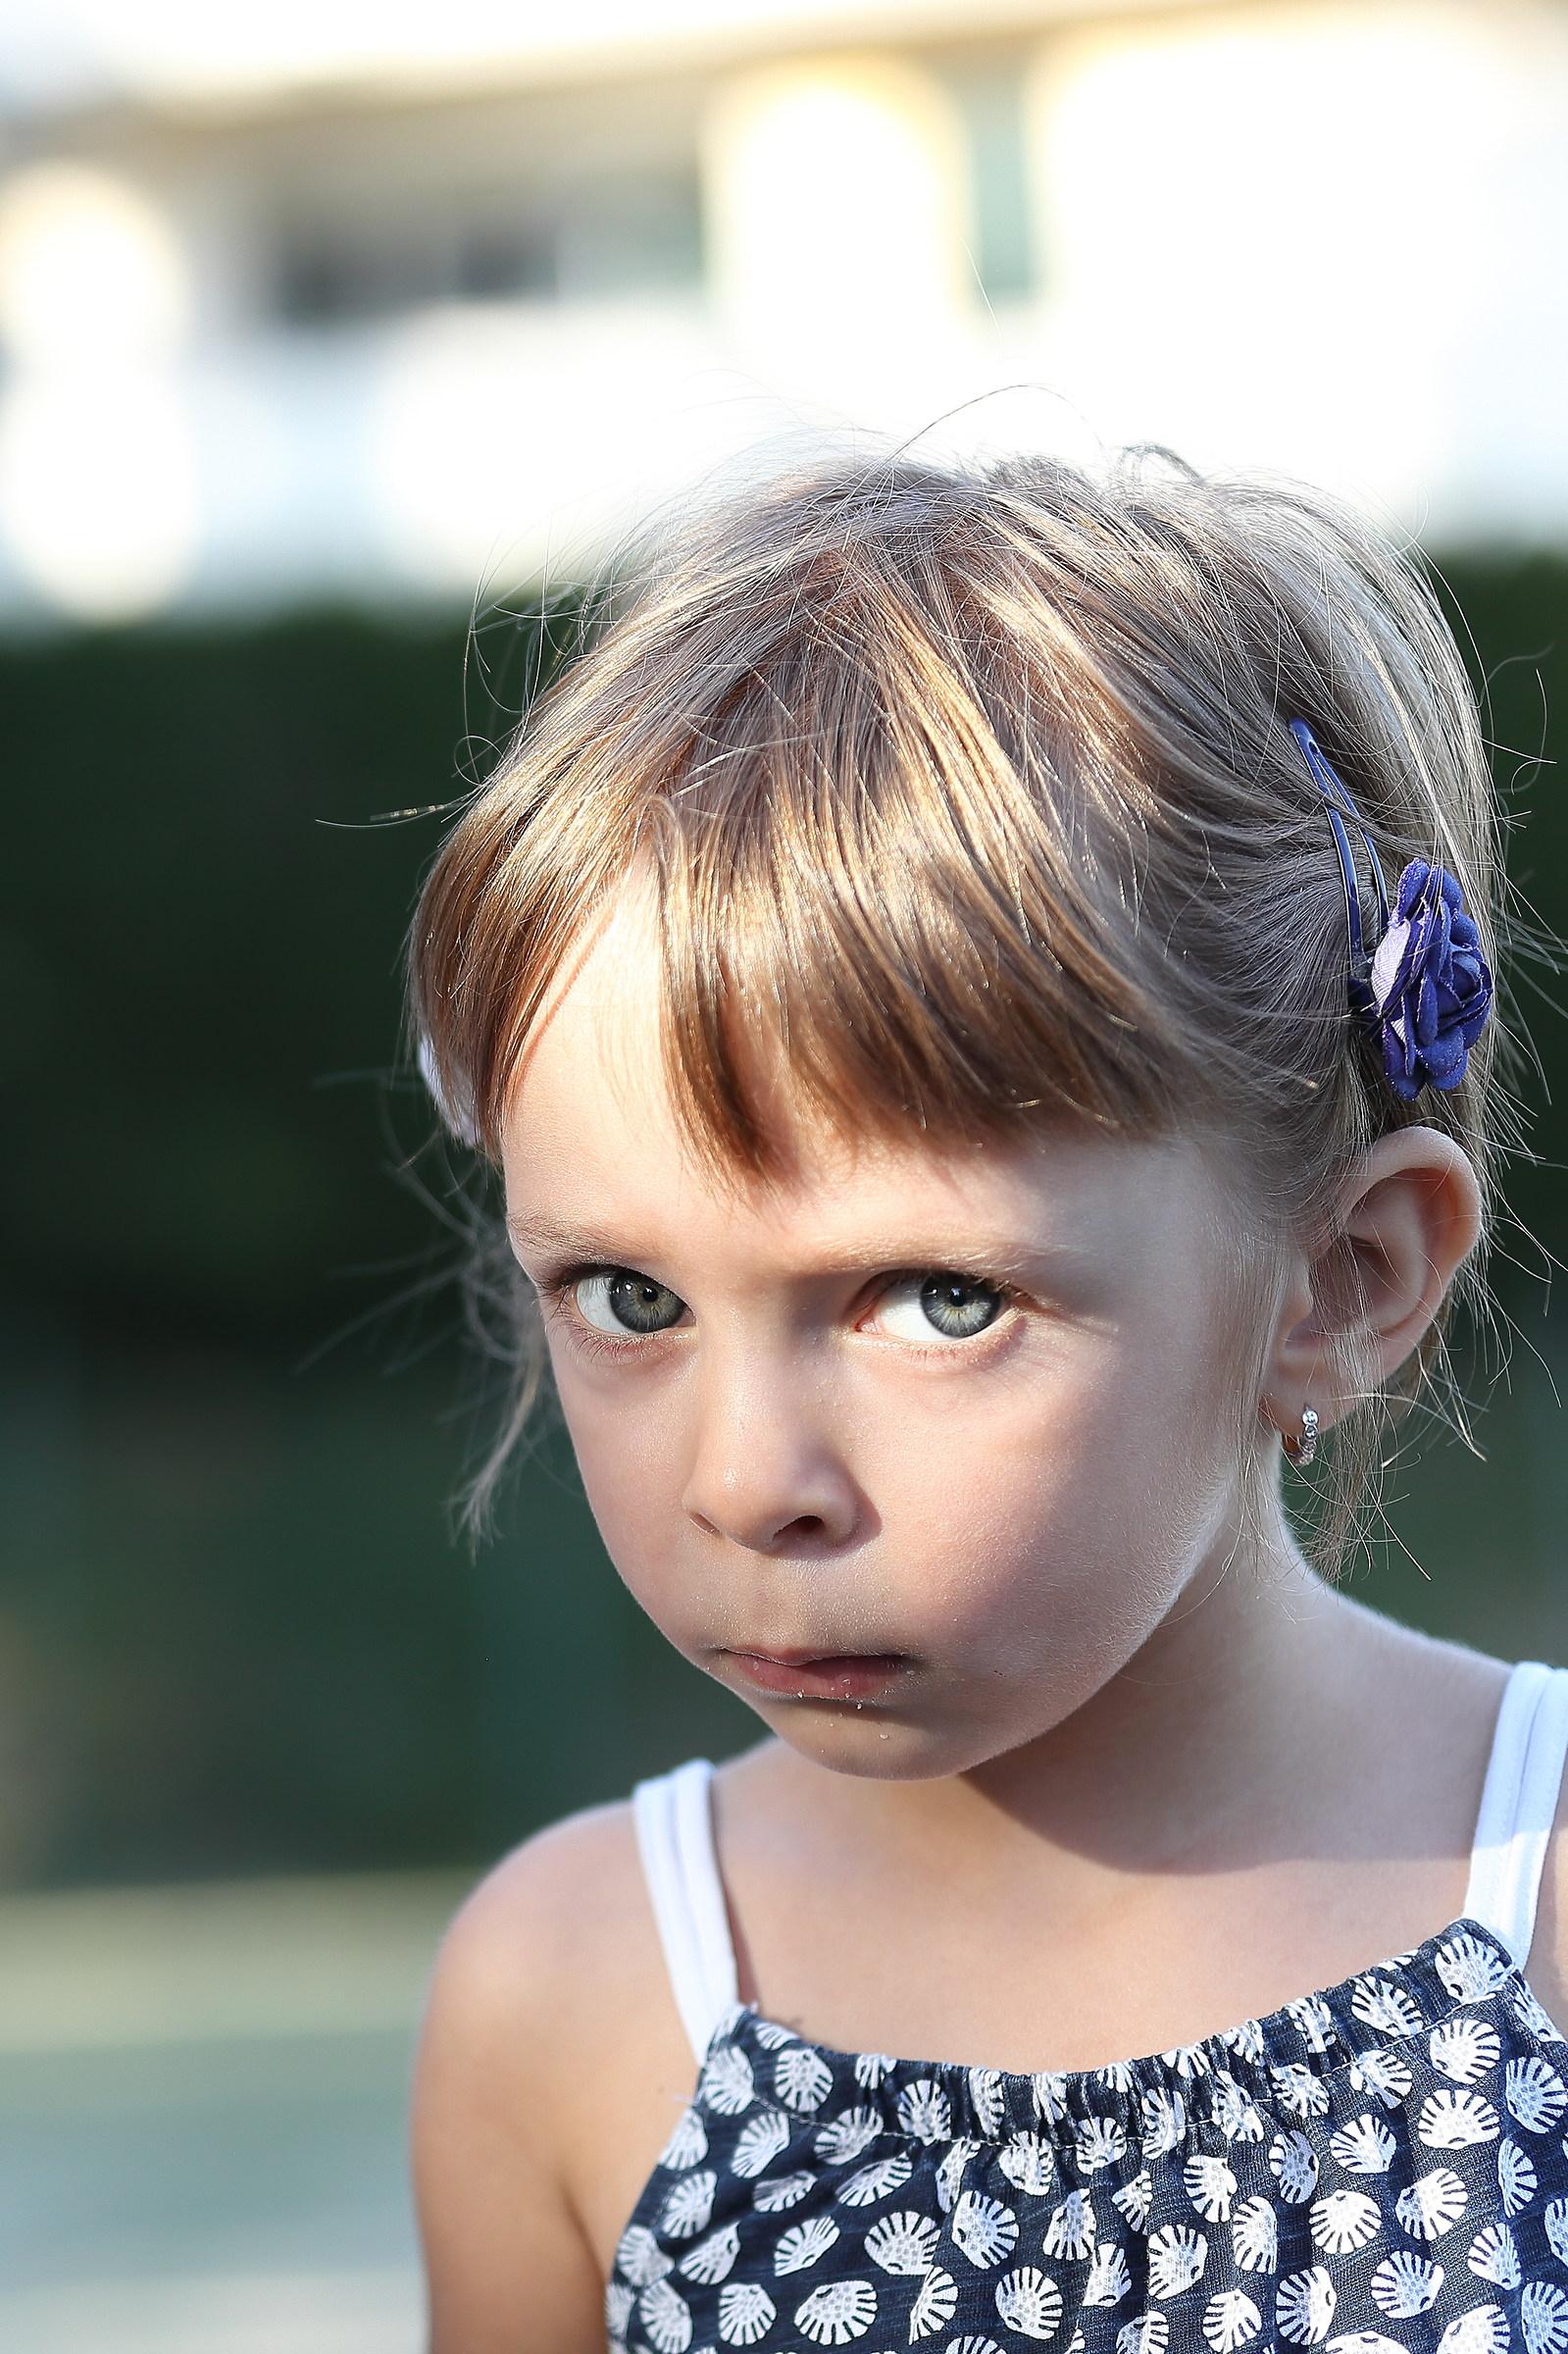 Little eyes: I don't trust you...